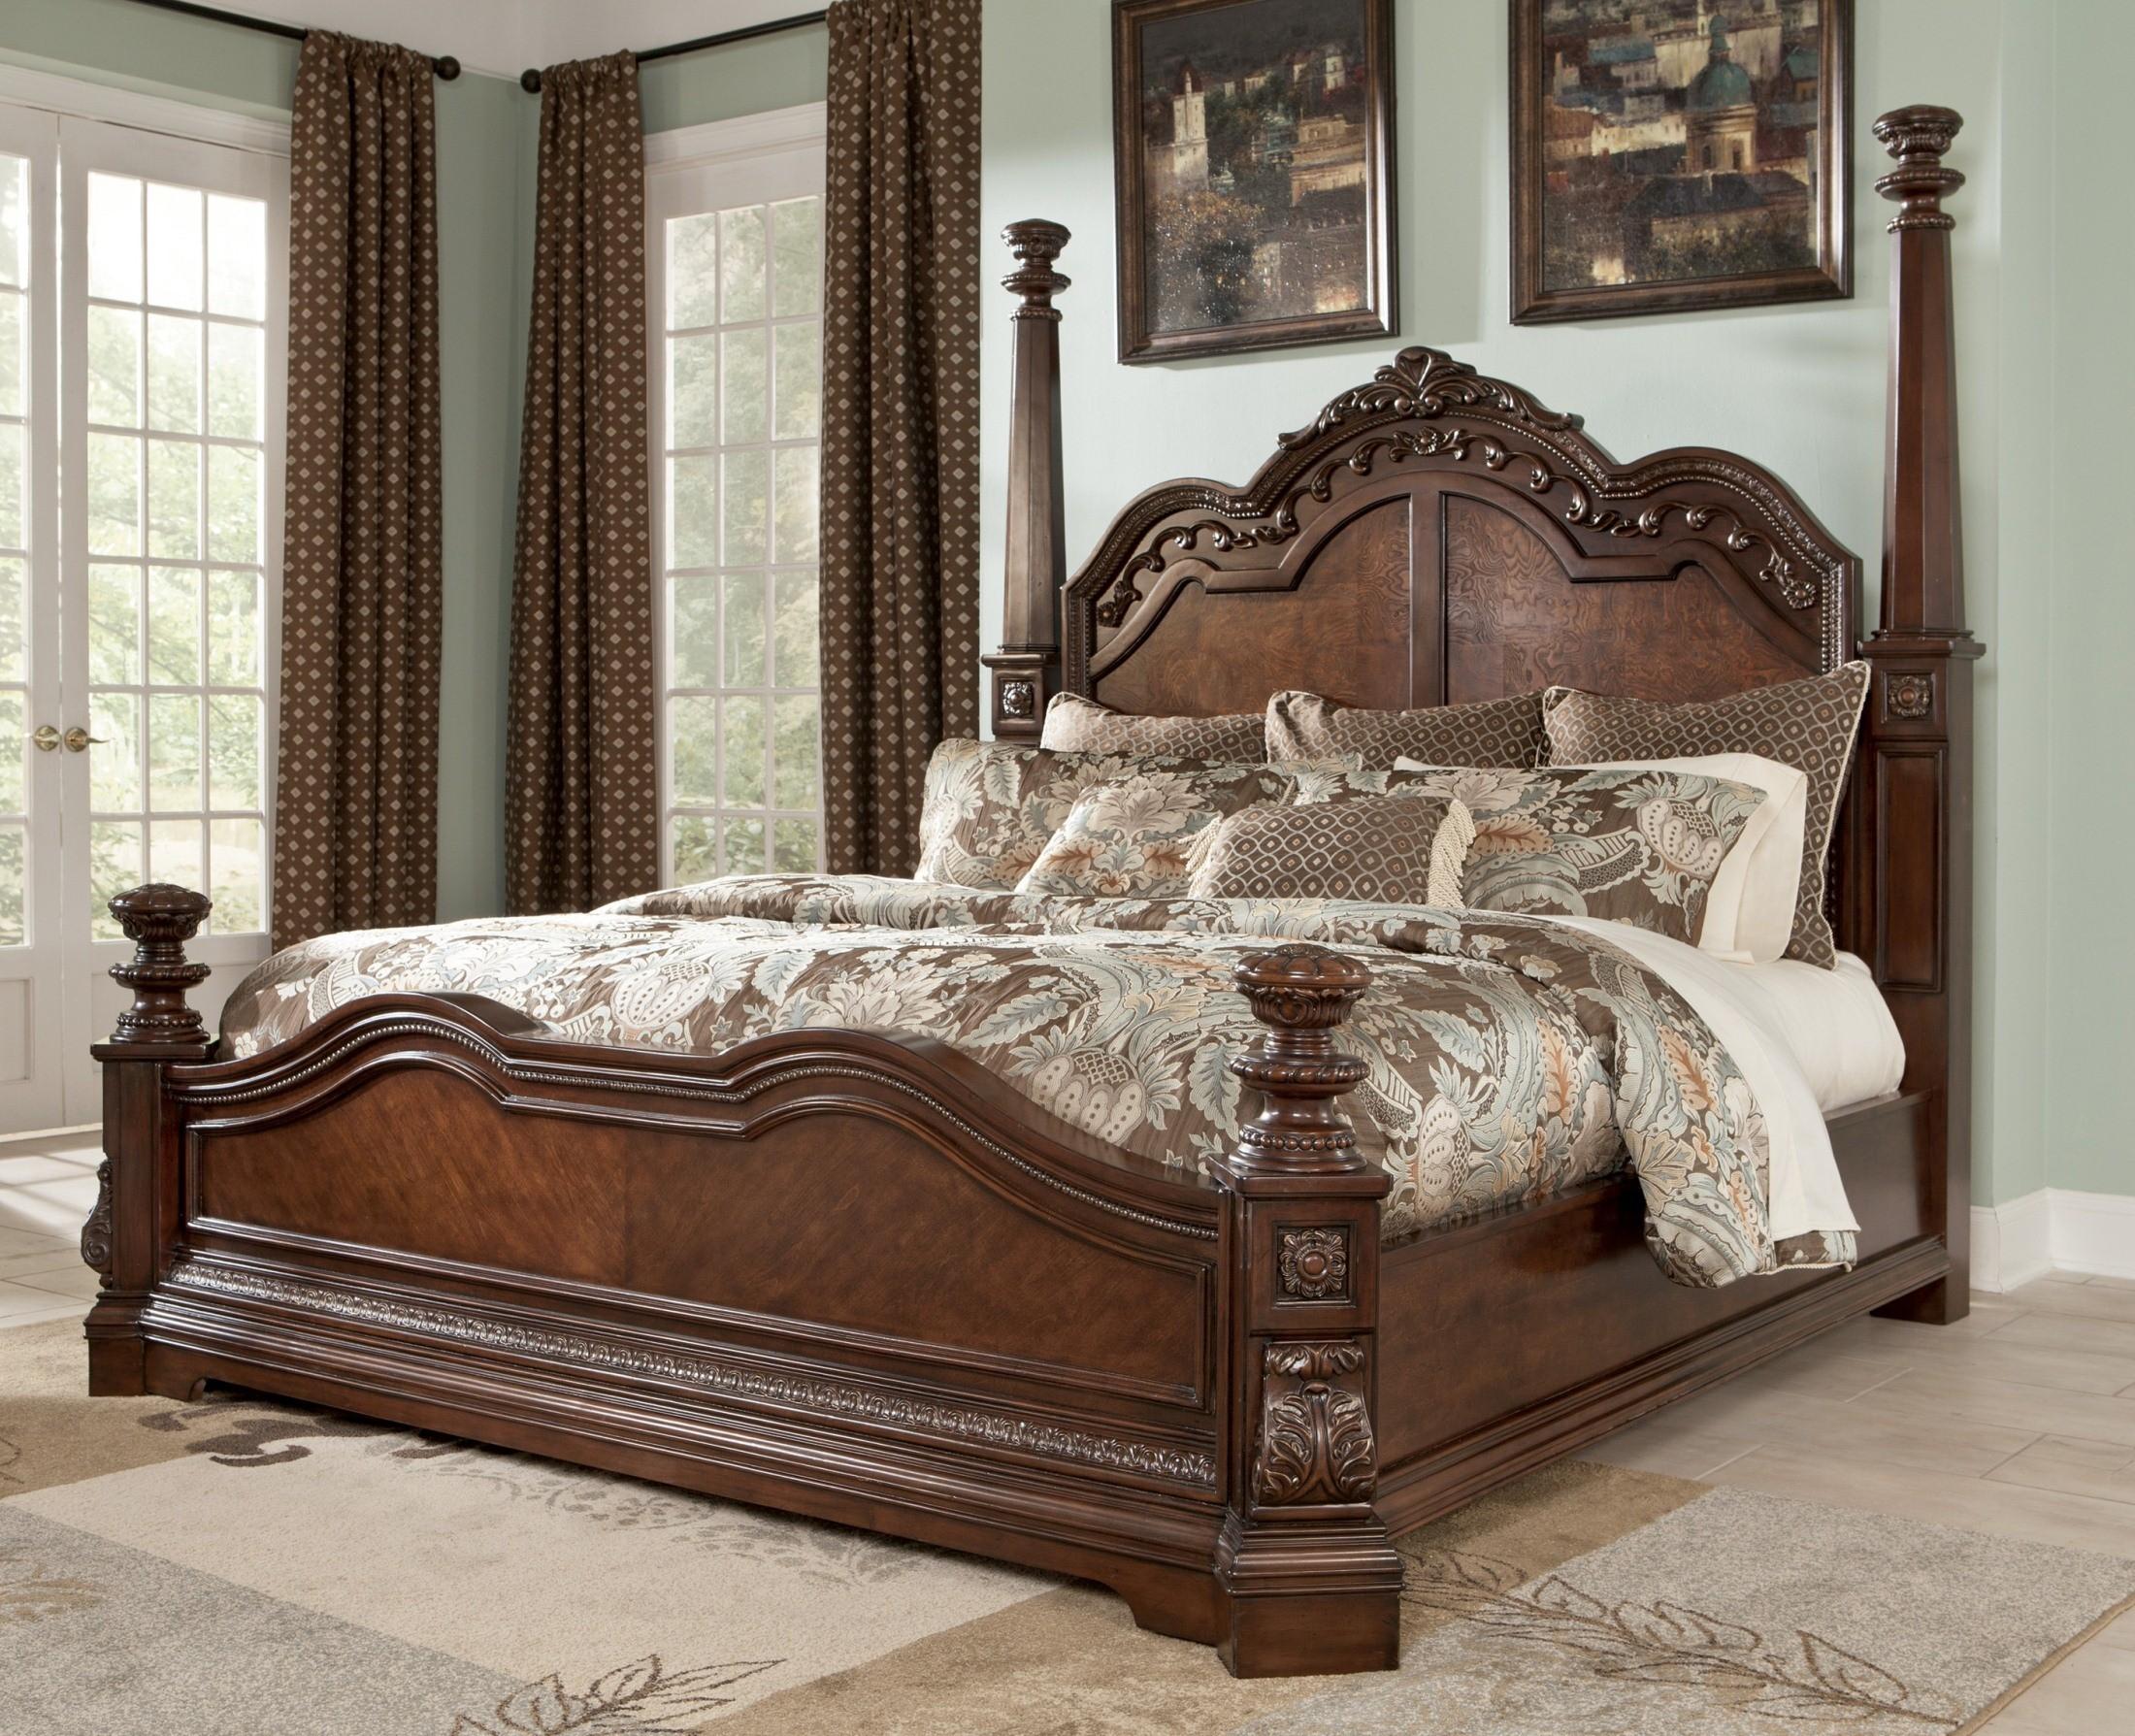 ledelle king poster bed from ashley b705517299